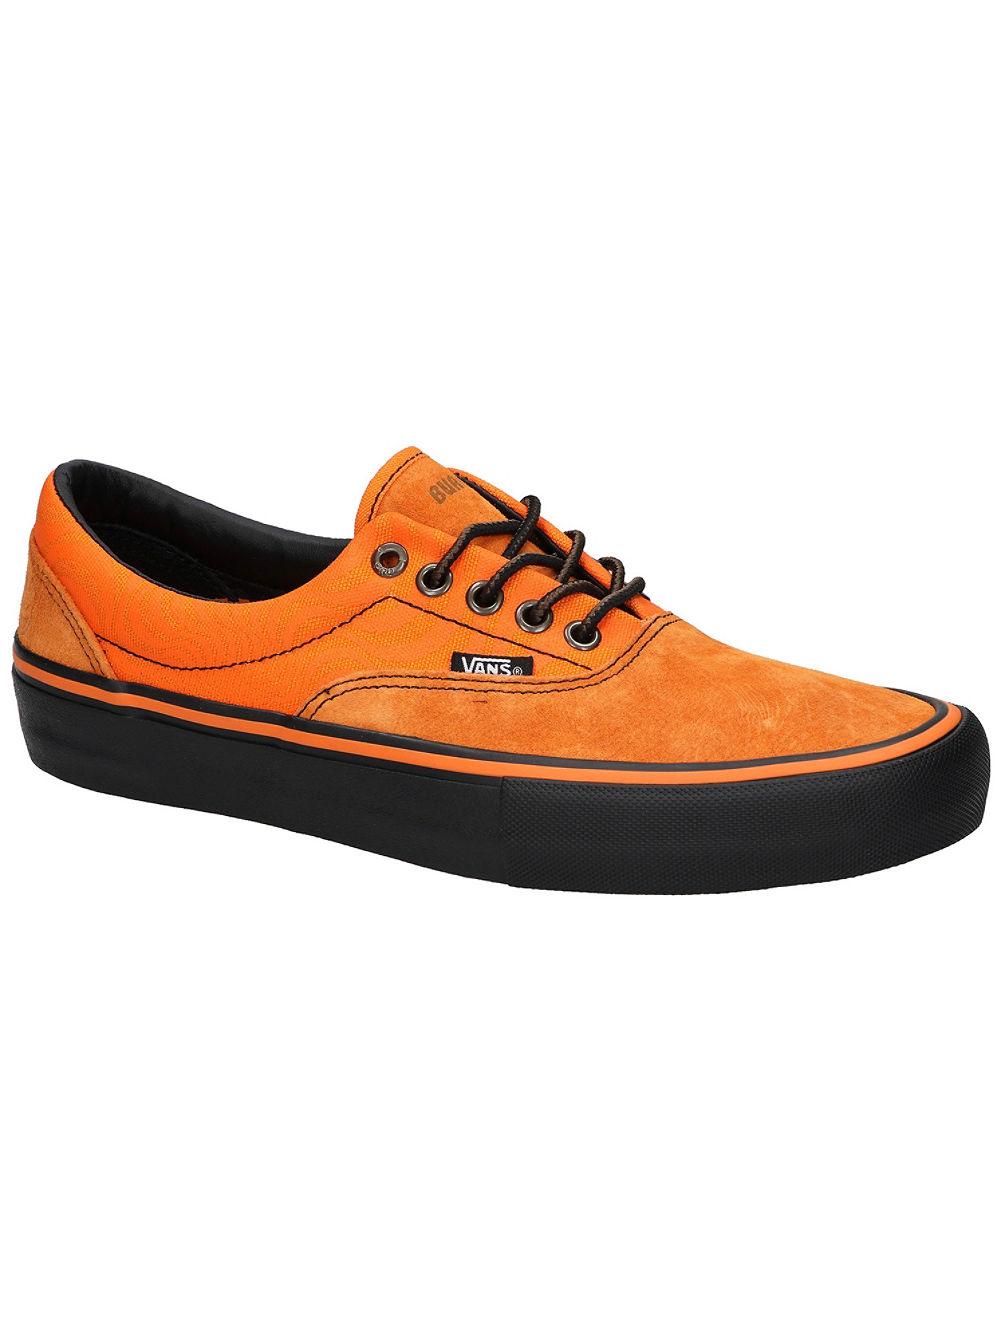 15872cf4cb Buy Vans Spitfire Era Pro Skate Shoes online at Blue Tomato